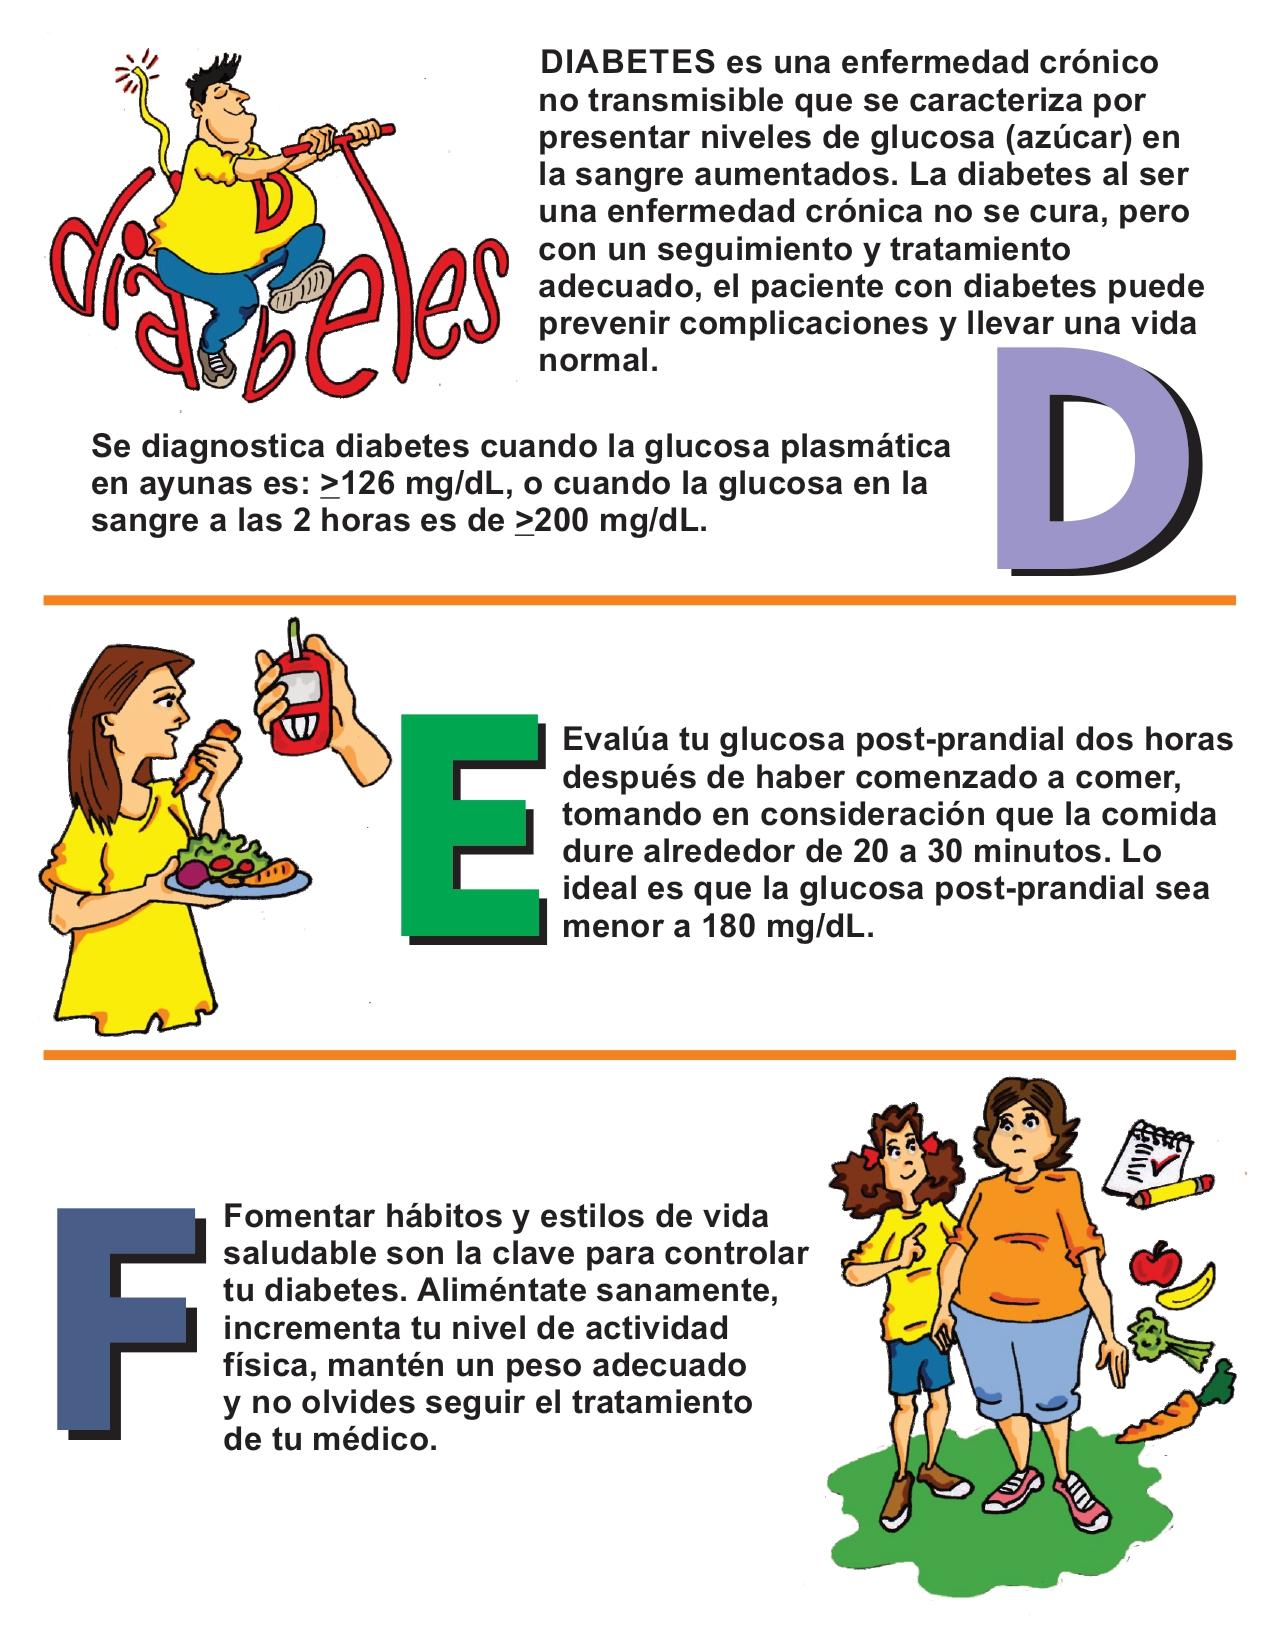 ABC automonitoreo diabetes_pages-to-jpg-0004